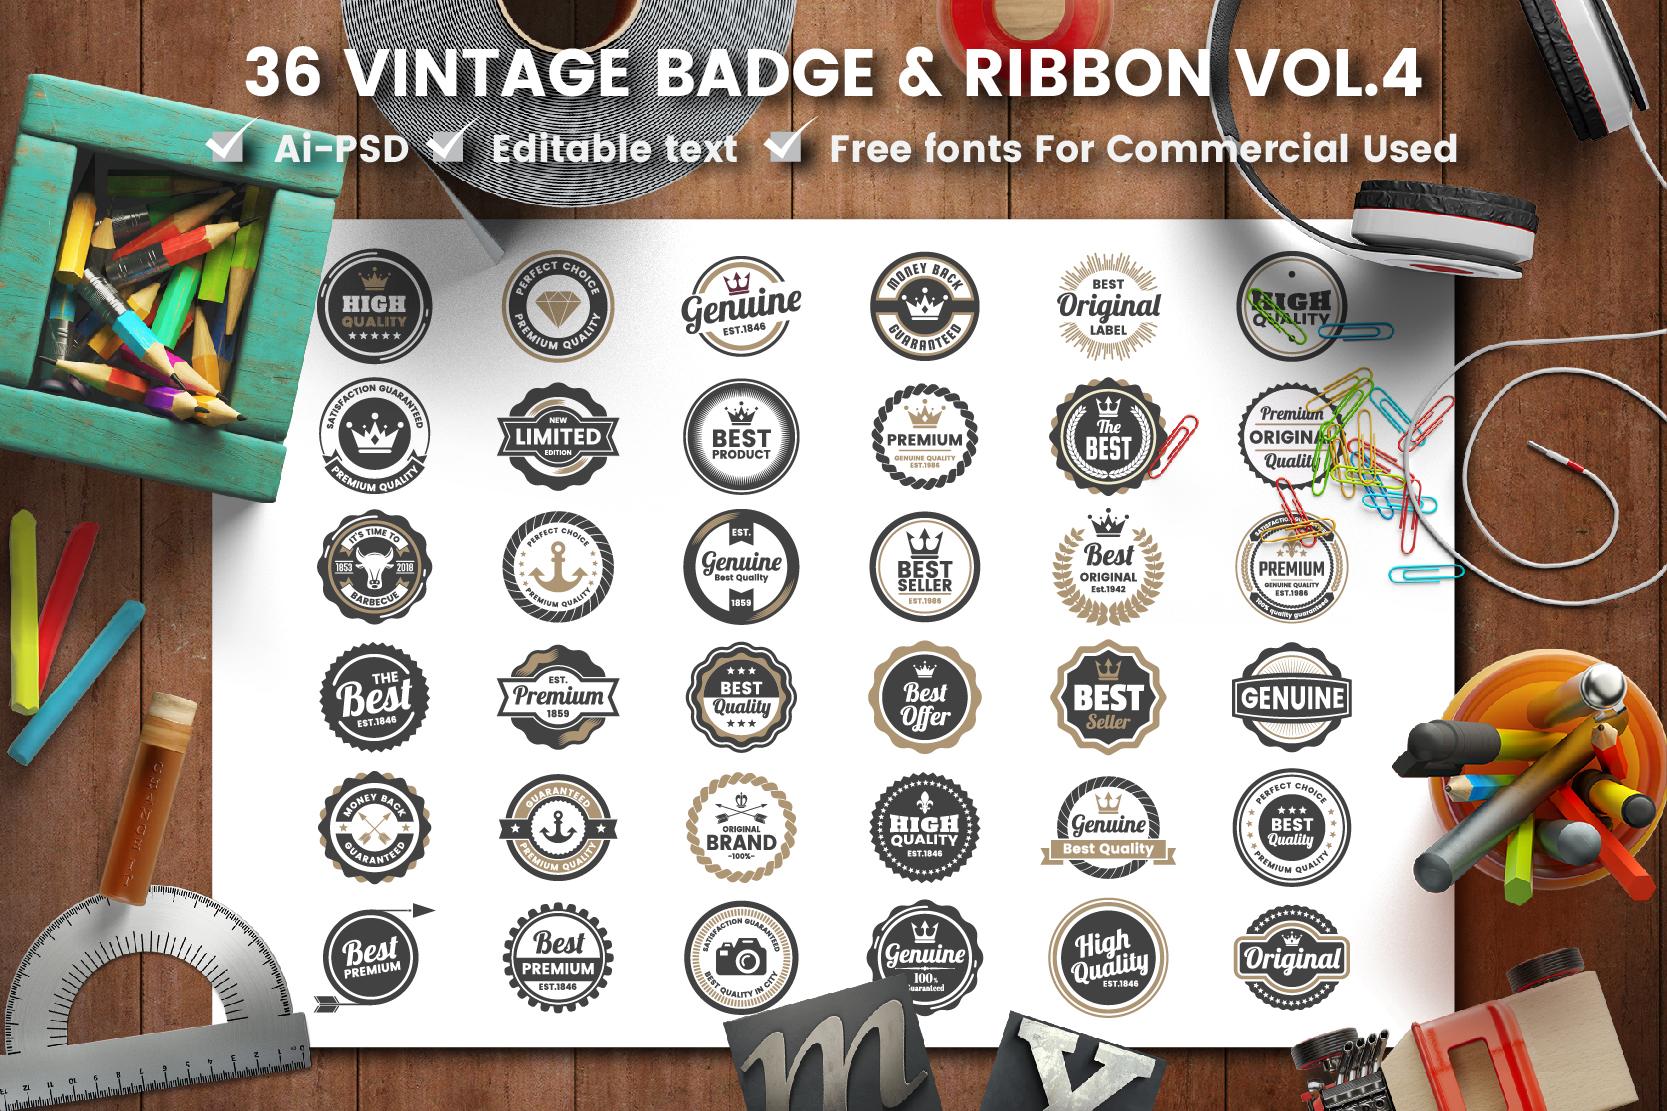 36 VINTAGE BADGE & RIBBON Vol.4 example image 1